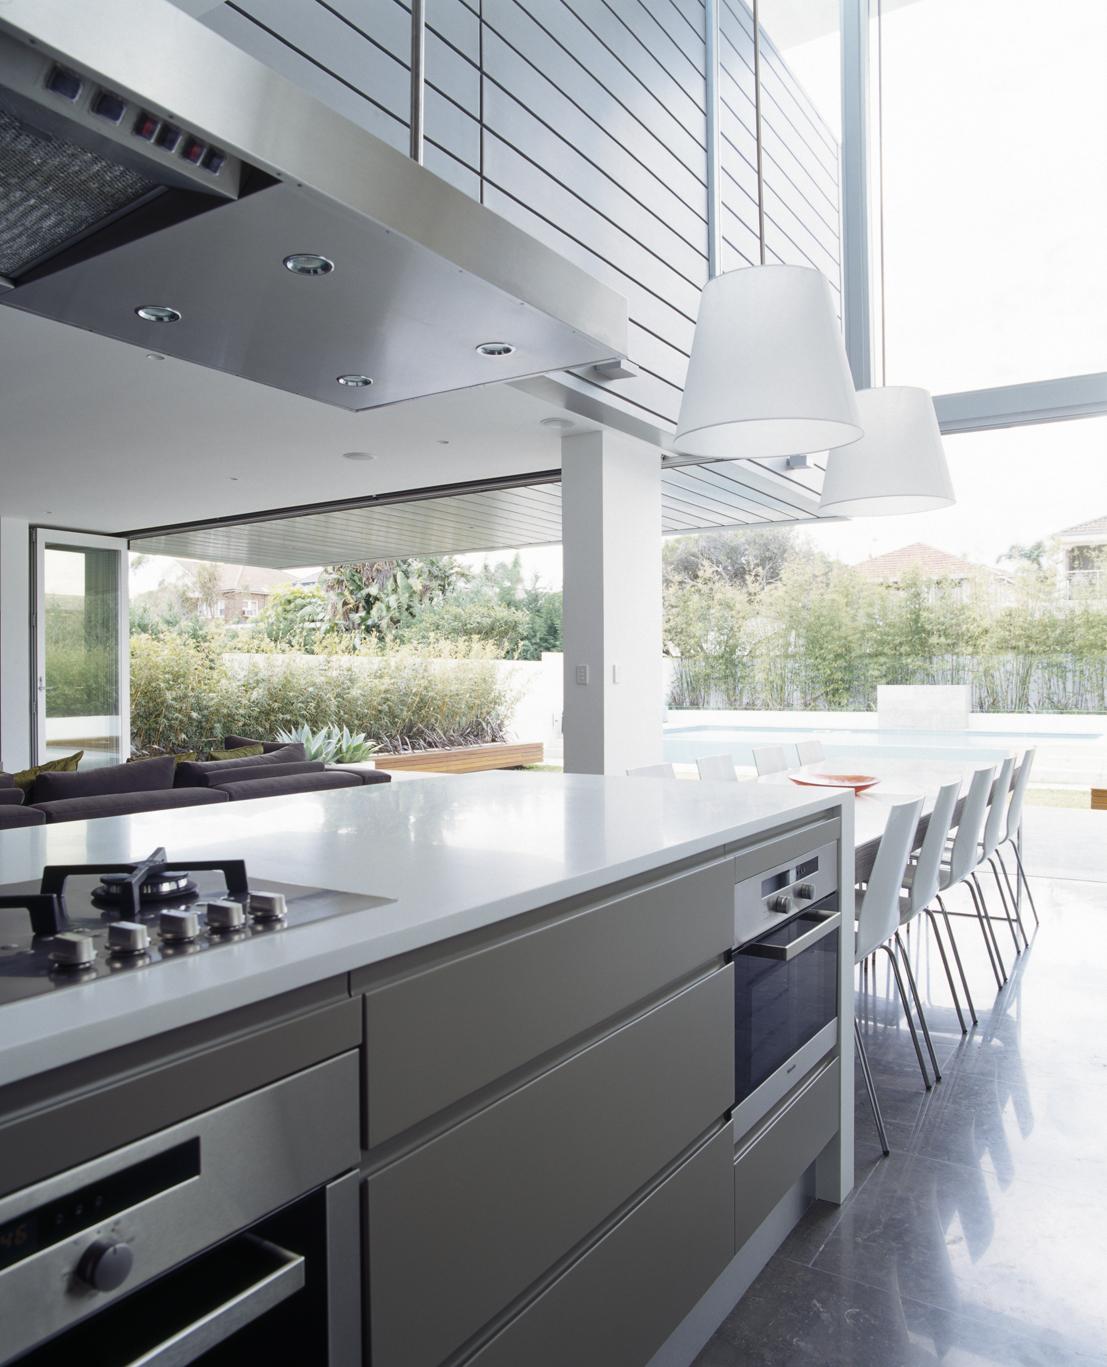 Sa Kitchen Designs: Minosa: Minosa Kitchen Design. Award Winning Design And